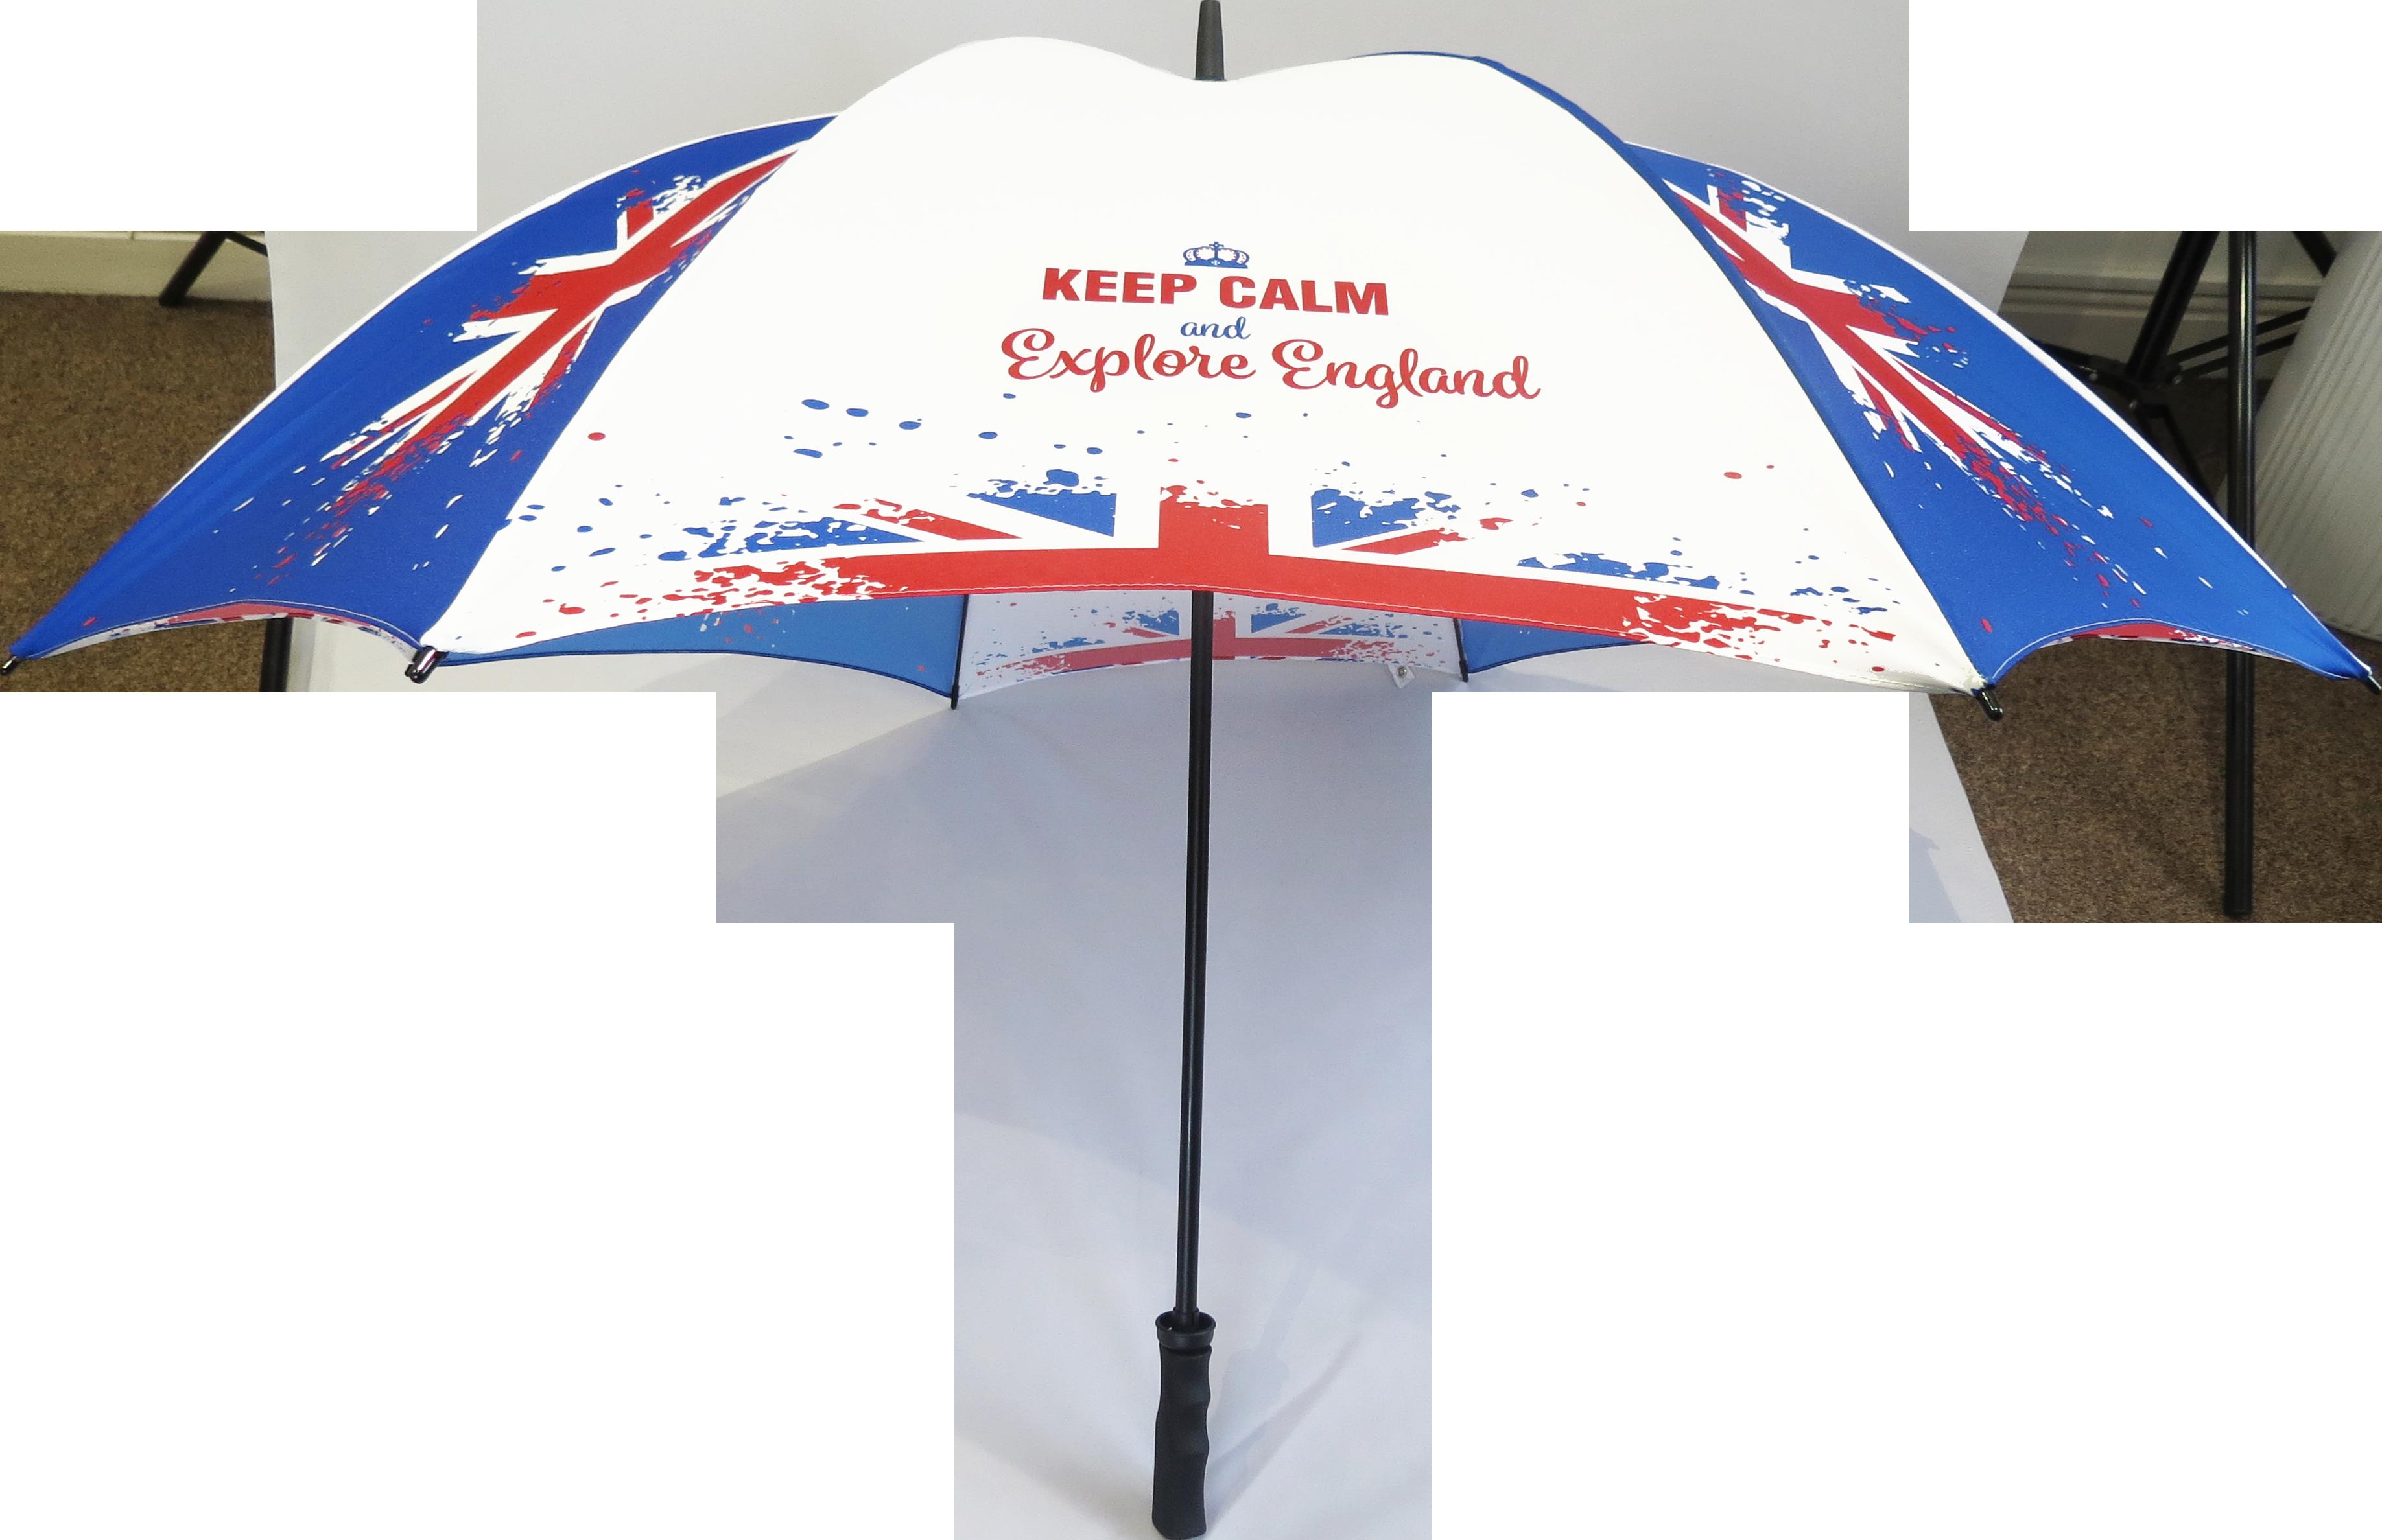 The stormsport uk company. Windy clipart windy umbrella